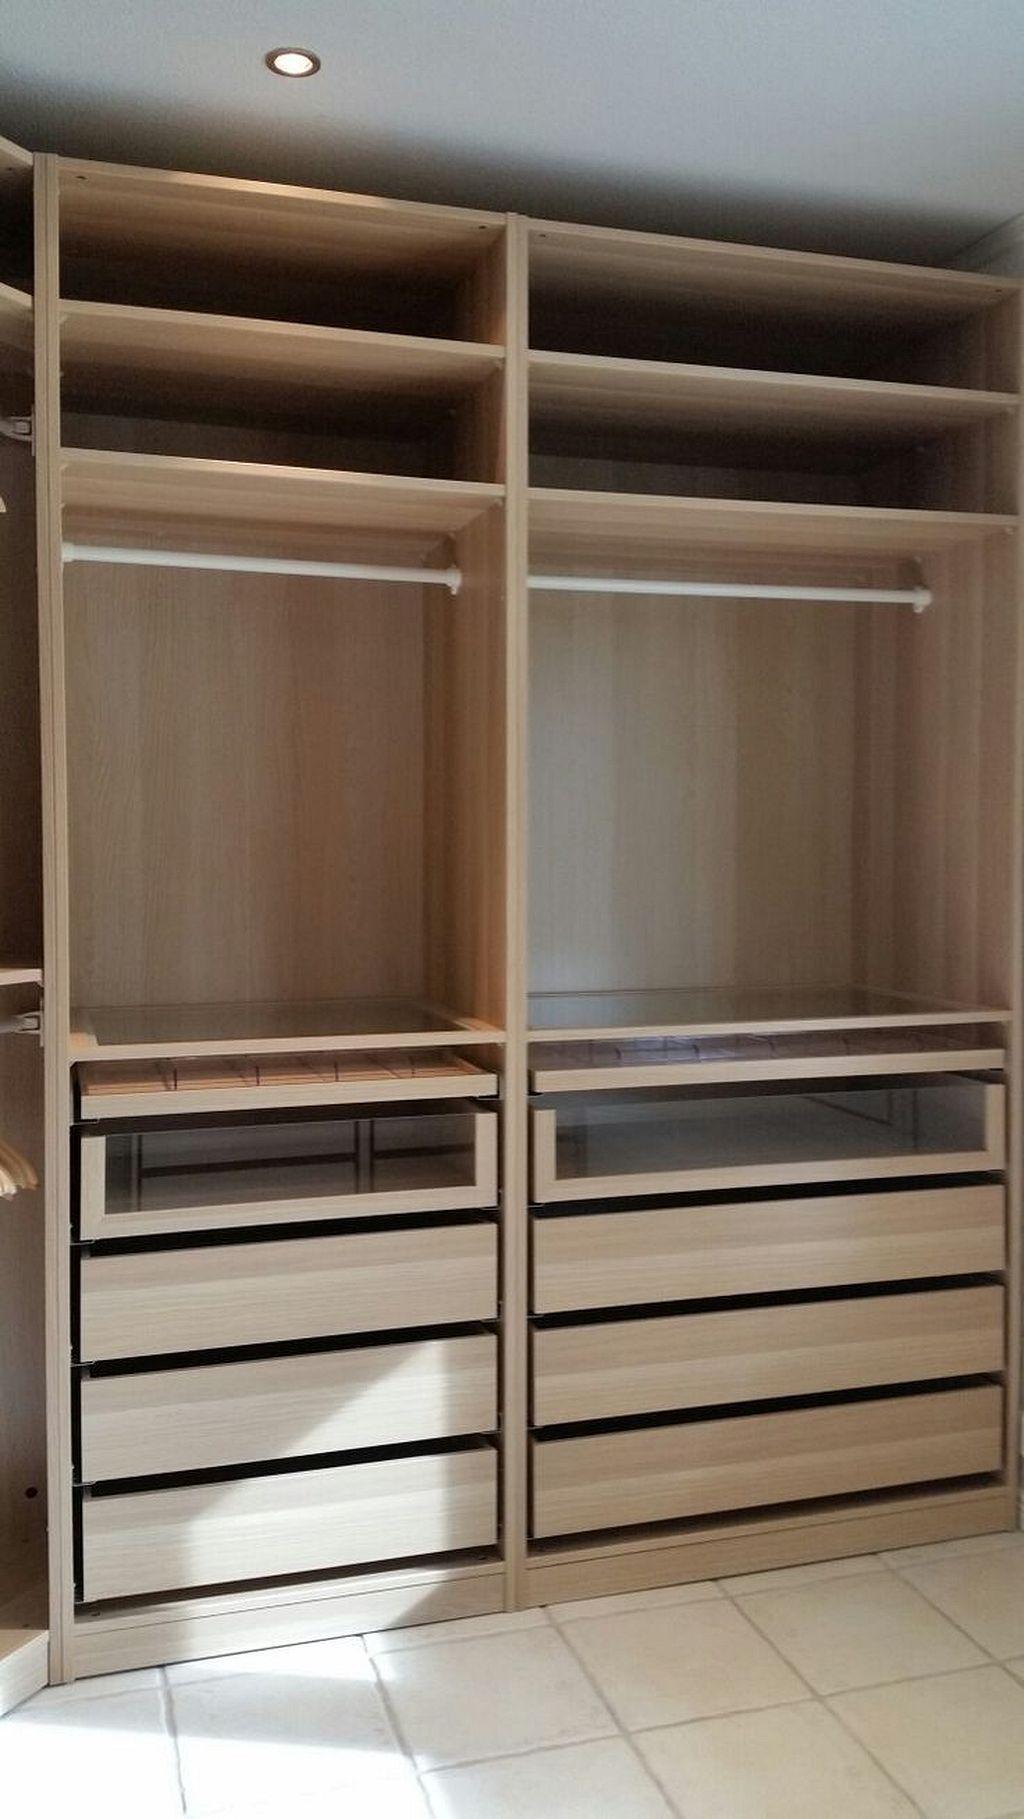 Cabina Armadio Su Misura Ikea.Create More Space In Your Homes With Ikea Pax Closet Nel 2020